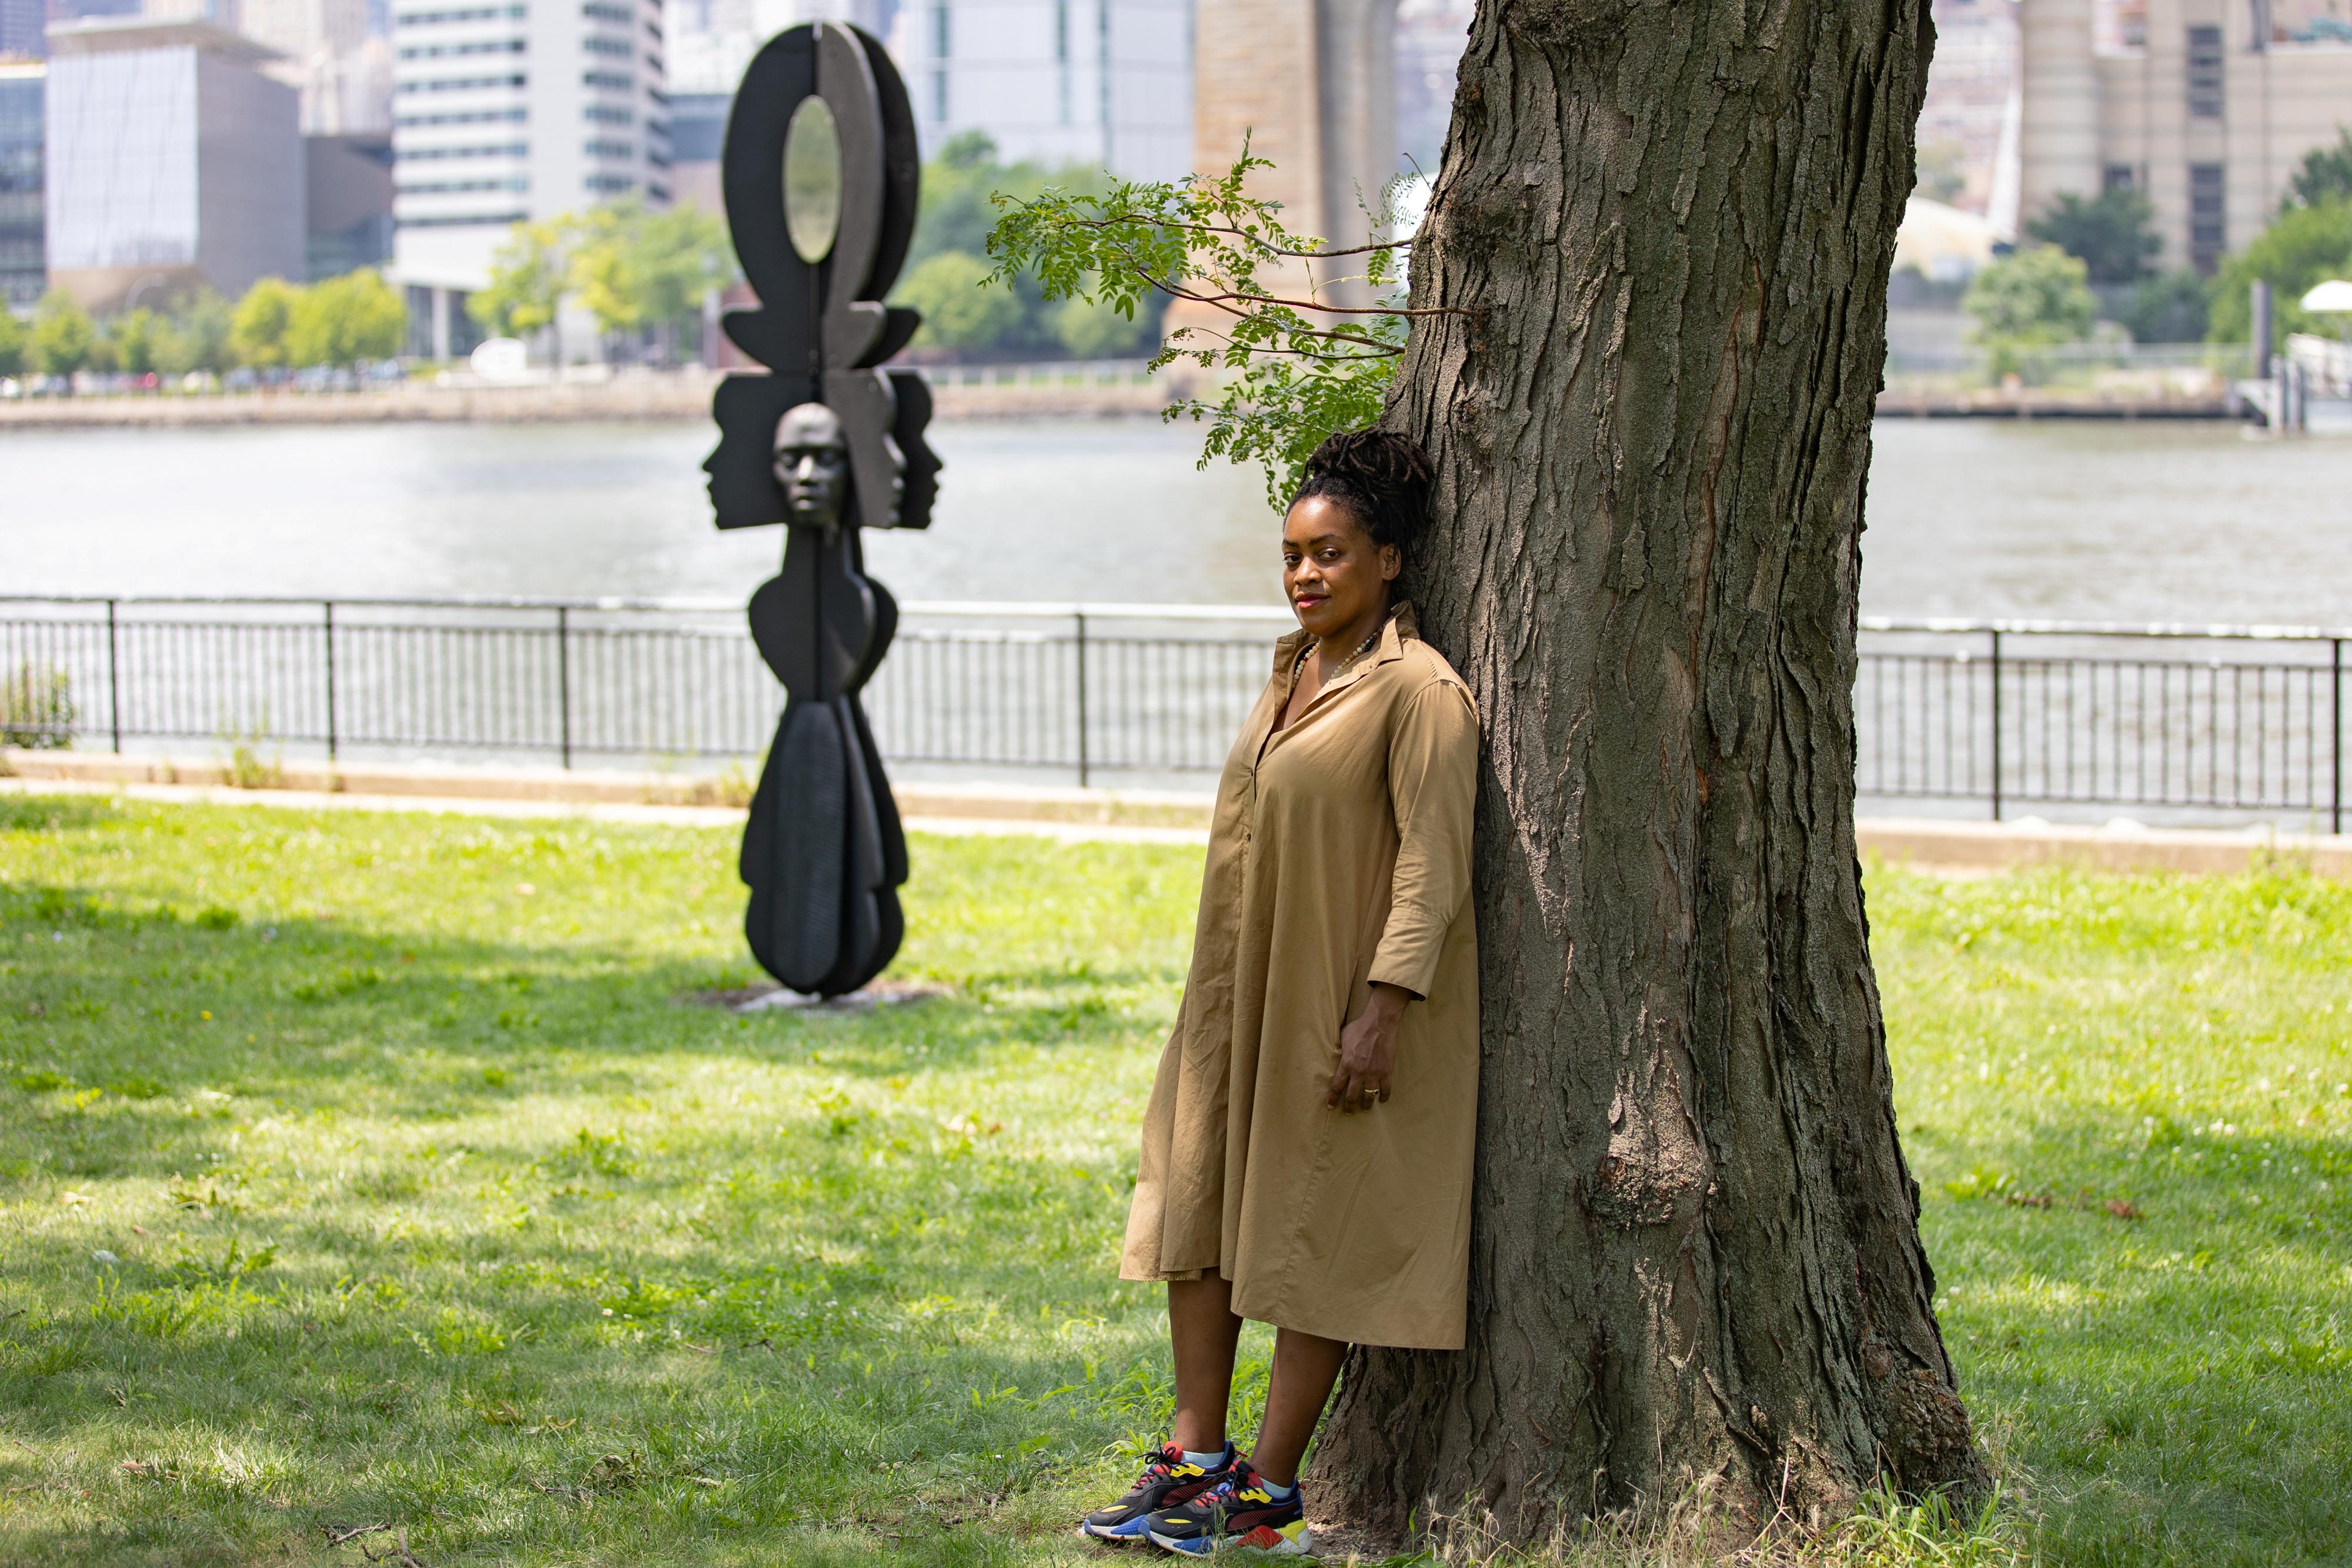 Artist Tanda Francis poses with her sculpture 'Be Heard' in Queensbridge Park, Queens borough of New York, U.S., July 16, 2021. REUTERS/Jeenah Moon